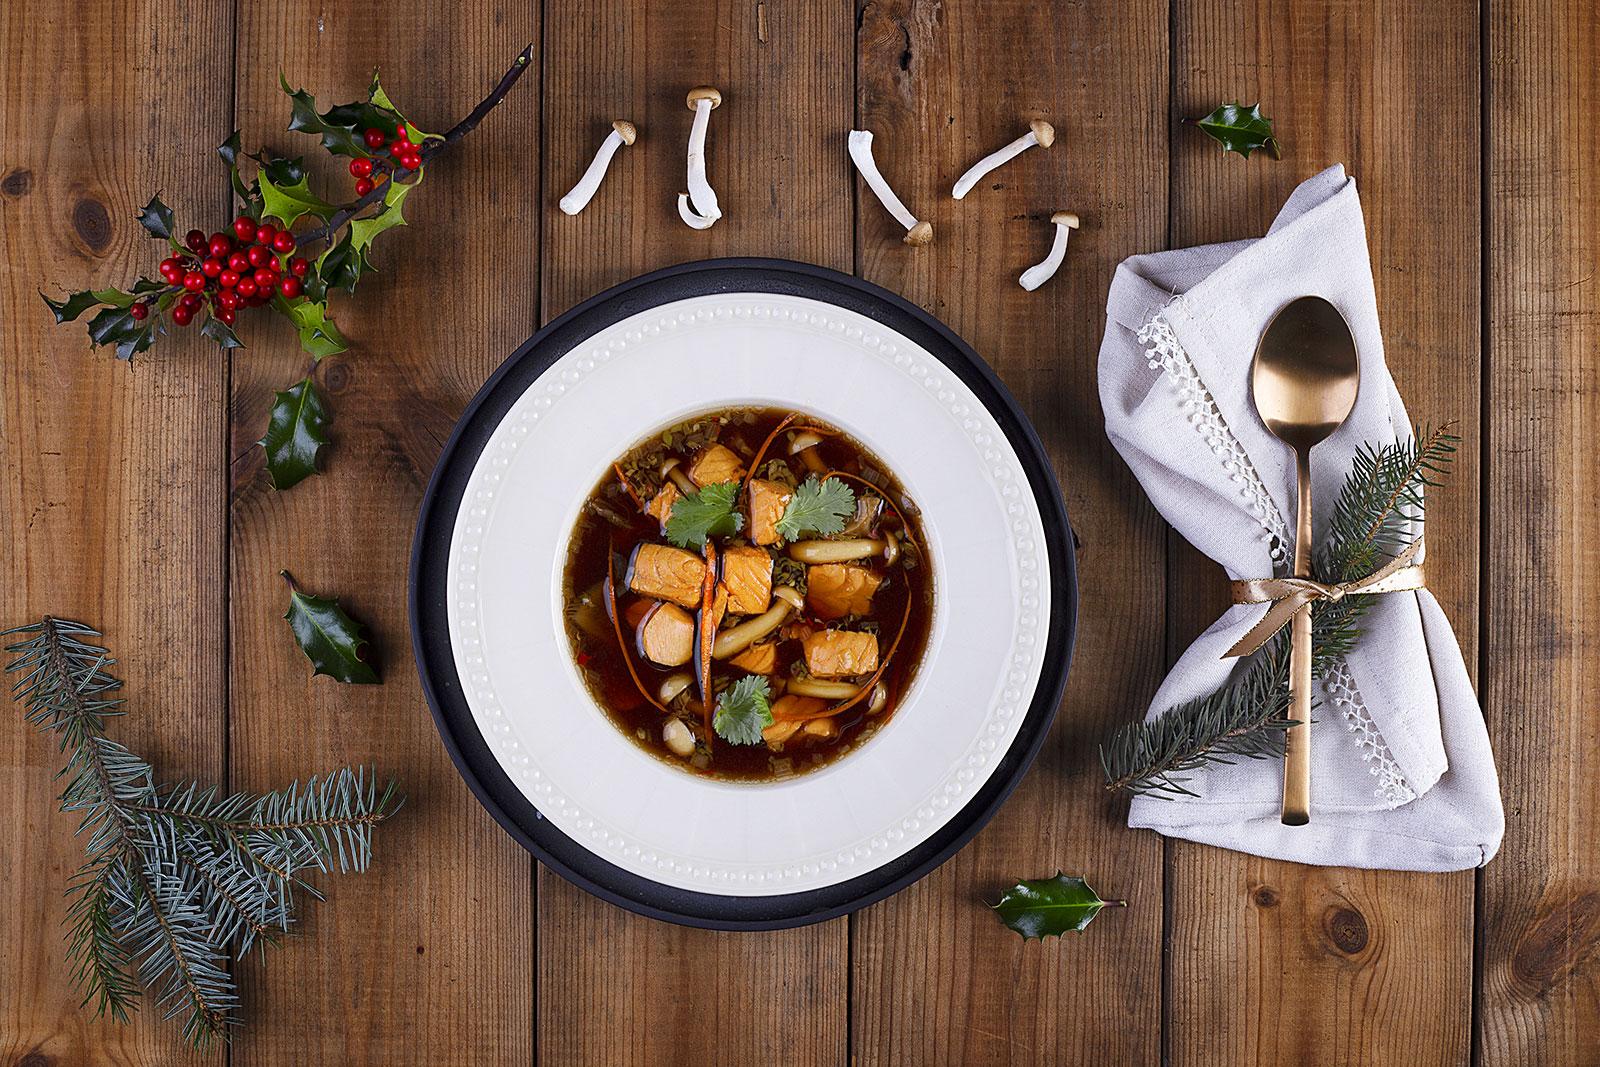 Zupa grzybowo-rybna